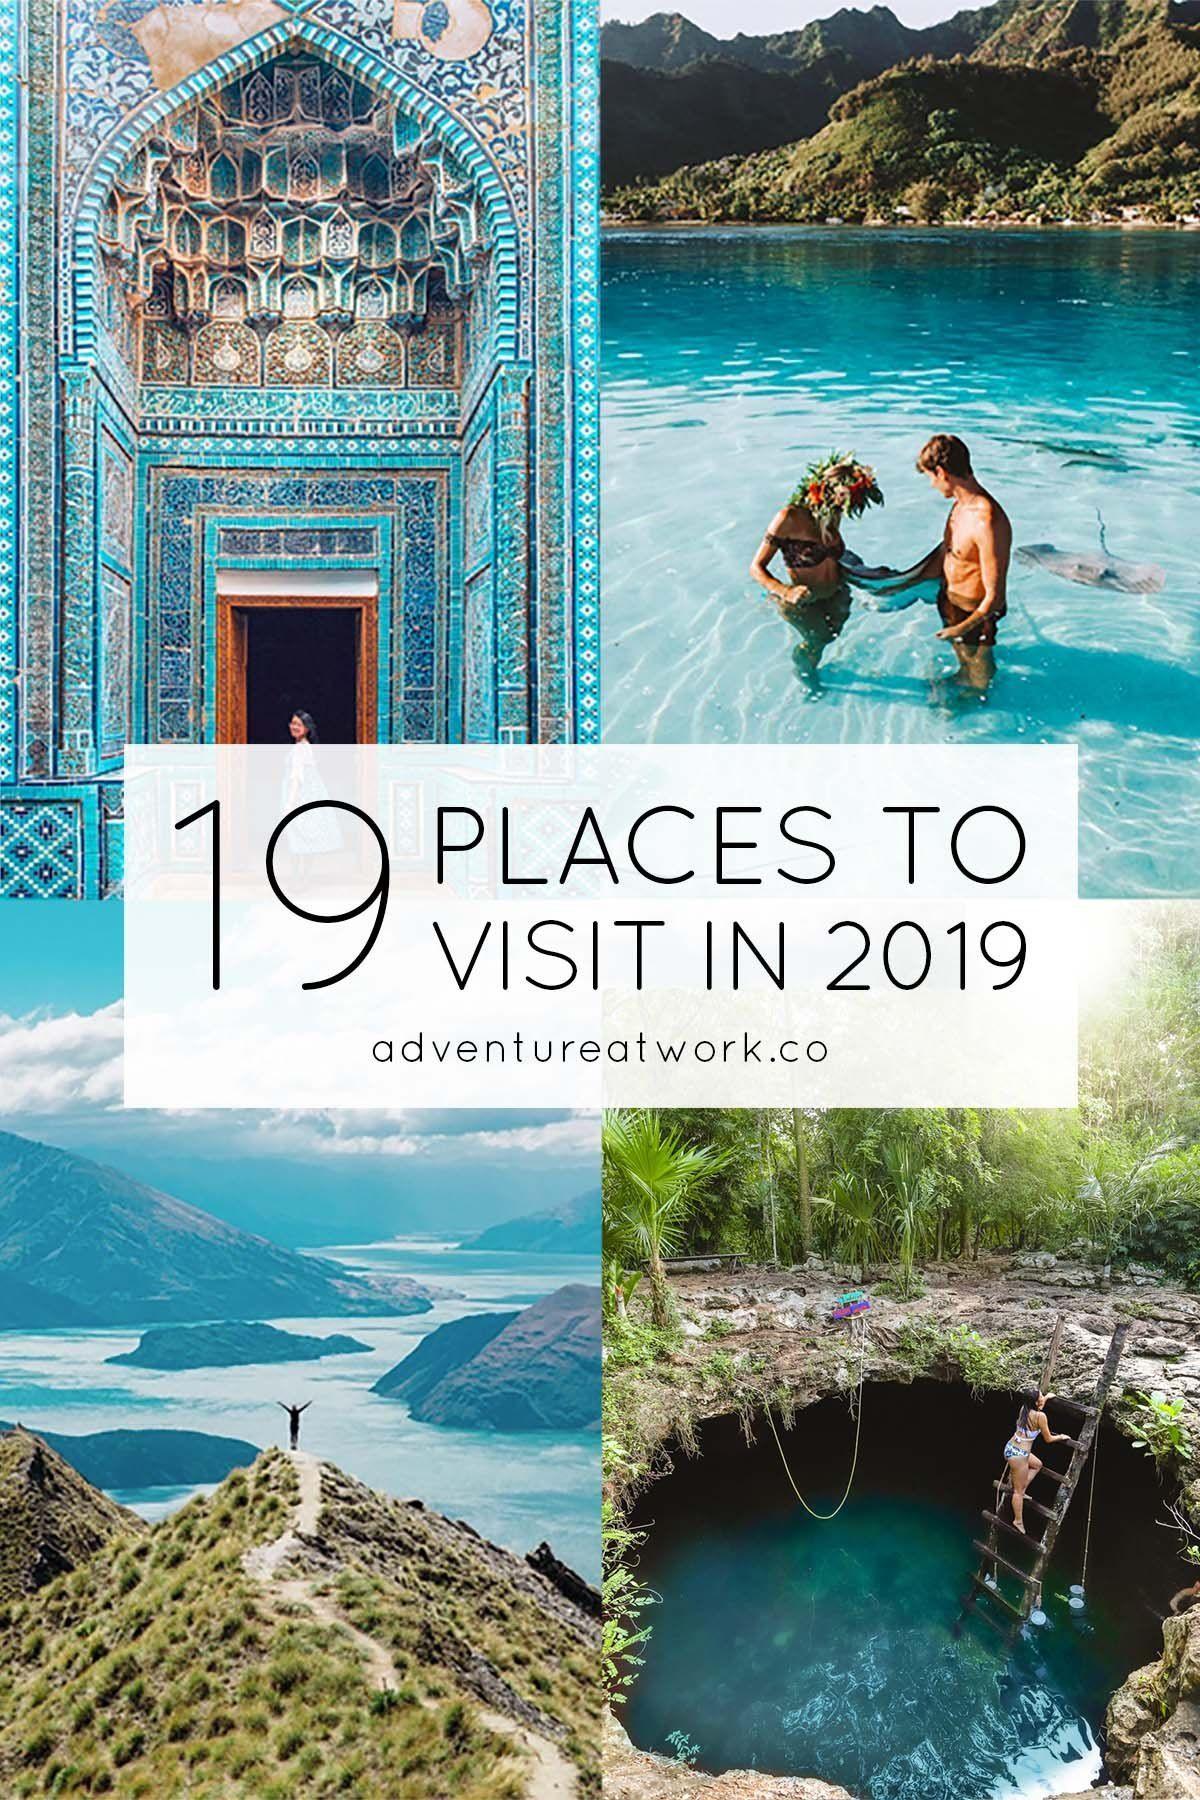 travel quotes travel essentials tourist attractions #TravelDestinations